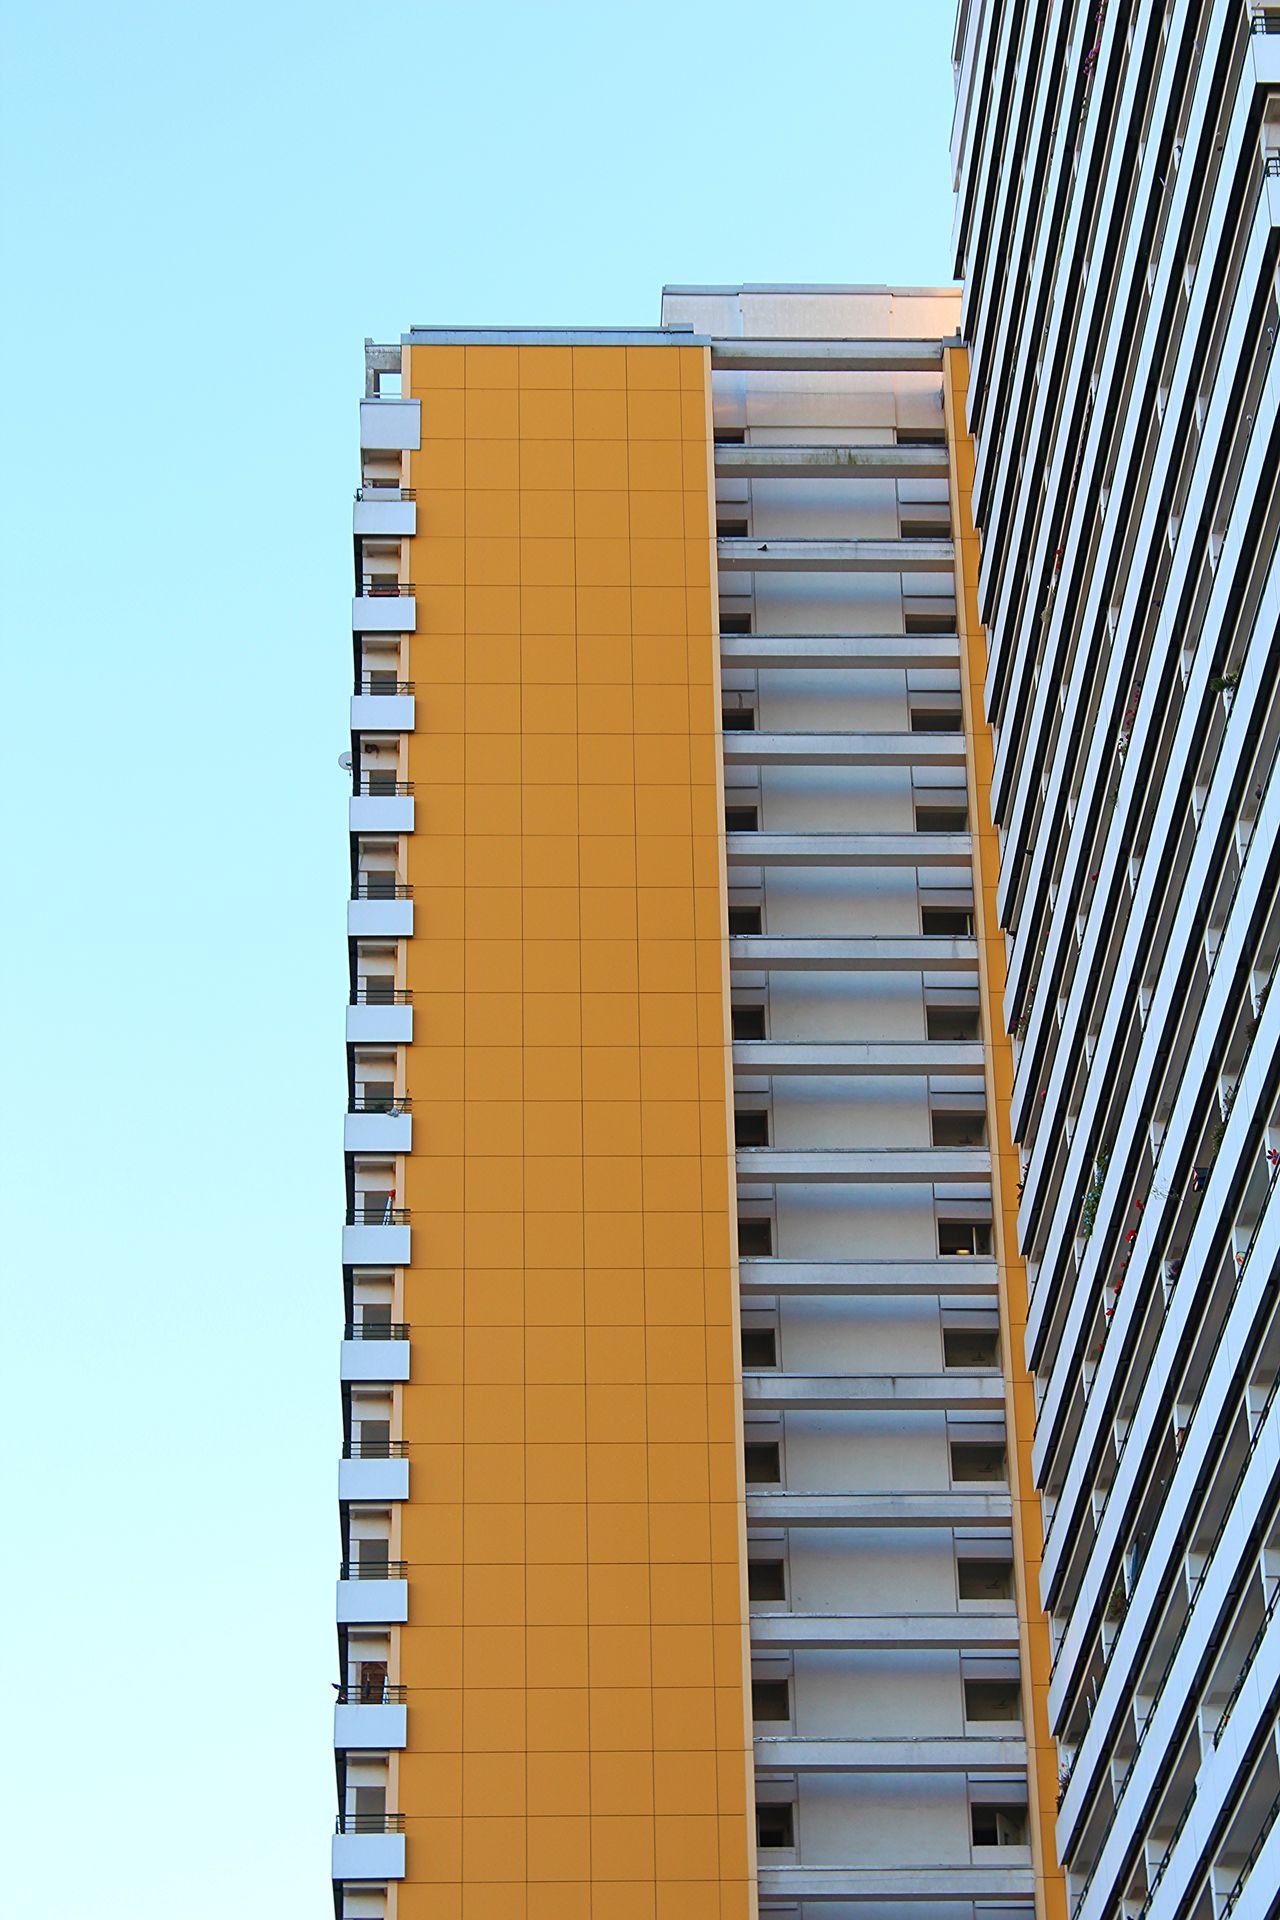 Architecture Berlin Blue Sky Blueandorange Blueskynocloud Buildingexterior Built Structure Clear Sky Complementary Colors ComplementaryContrast High Rise Building Marzahn No People Outdoors